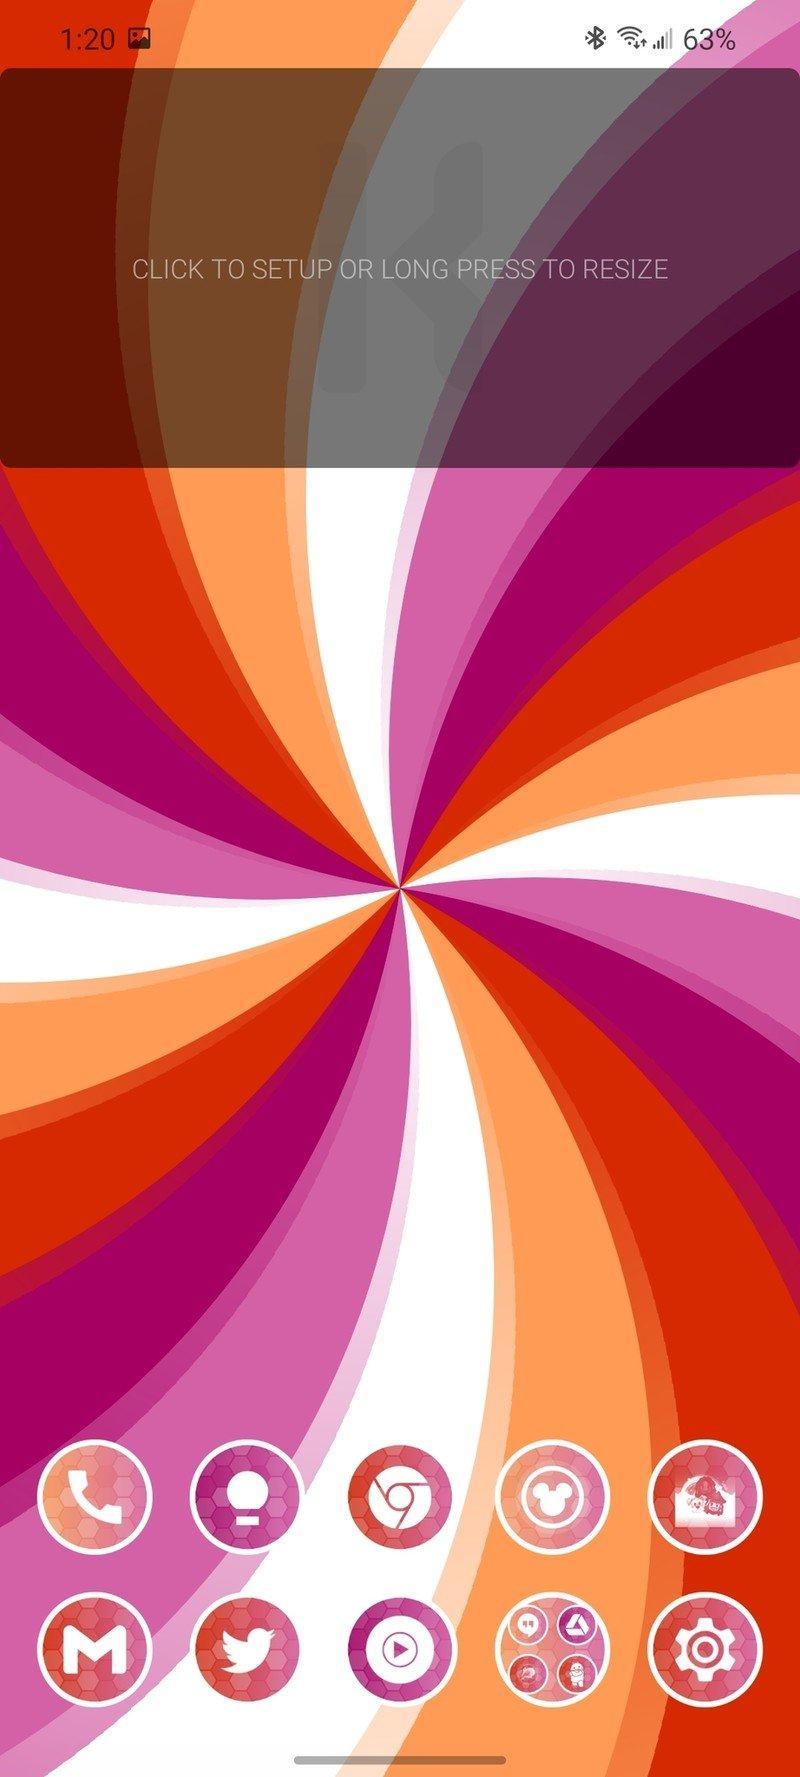 adding-kwgt-to-pride-theme-5.jpg